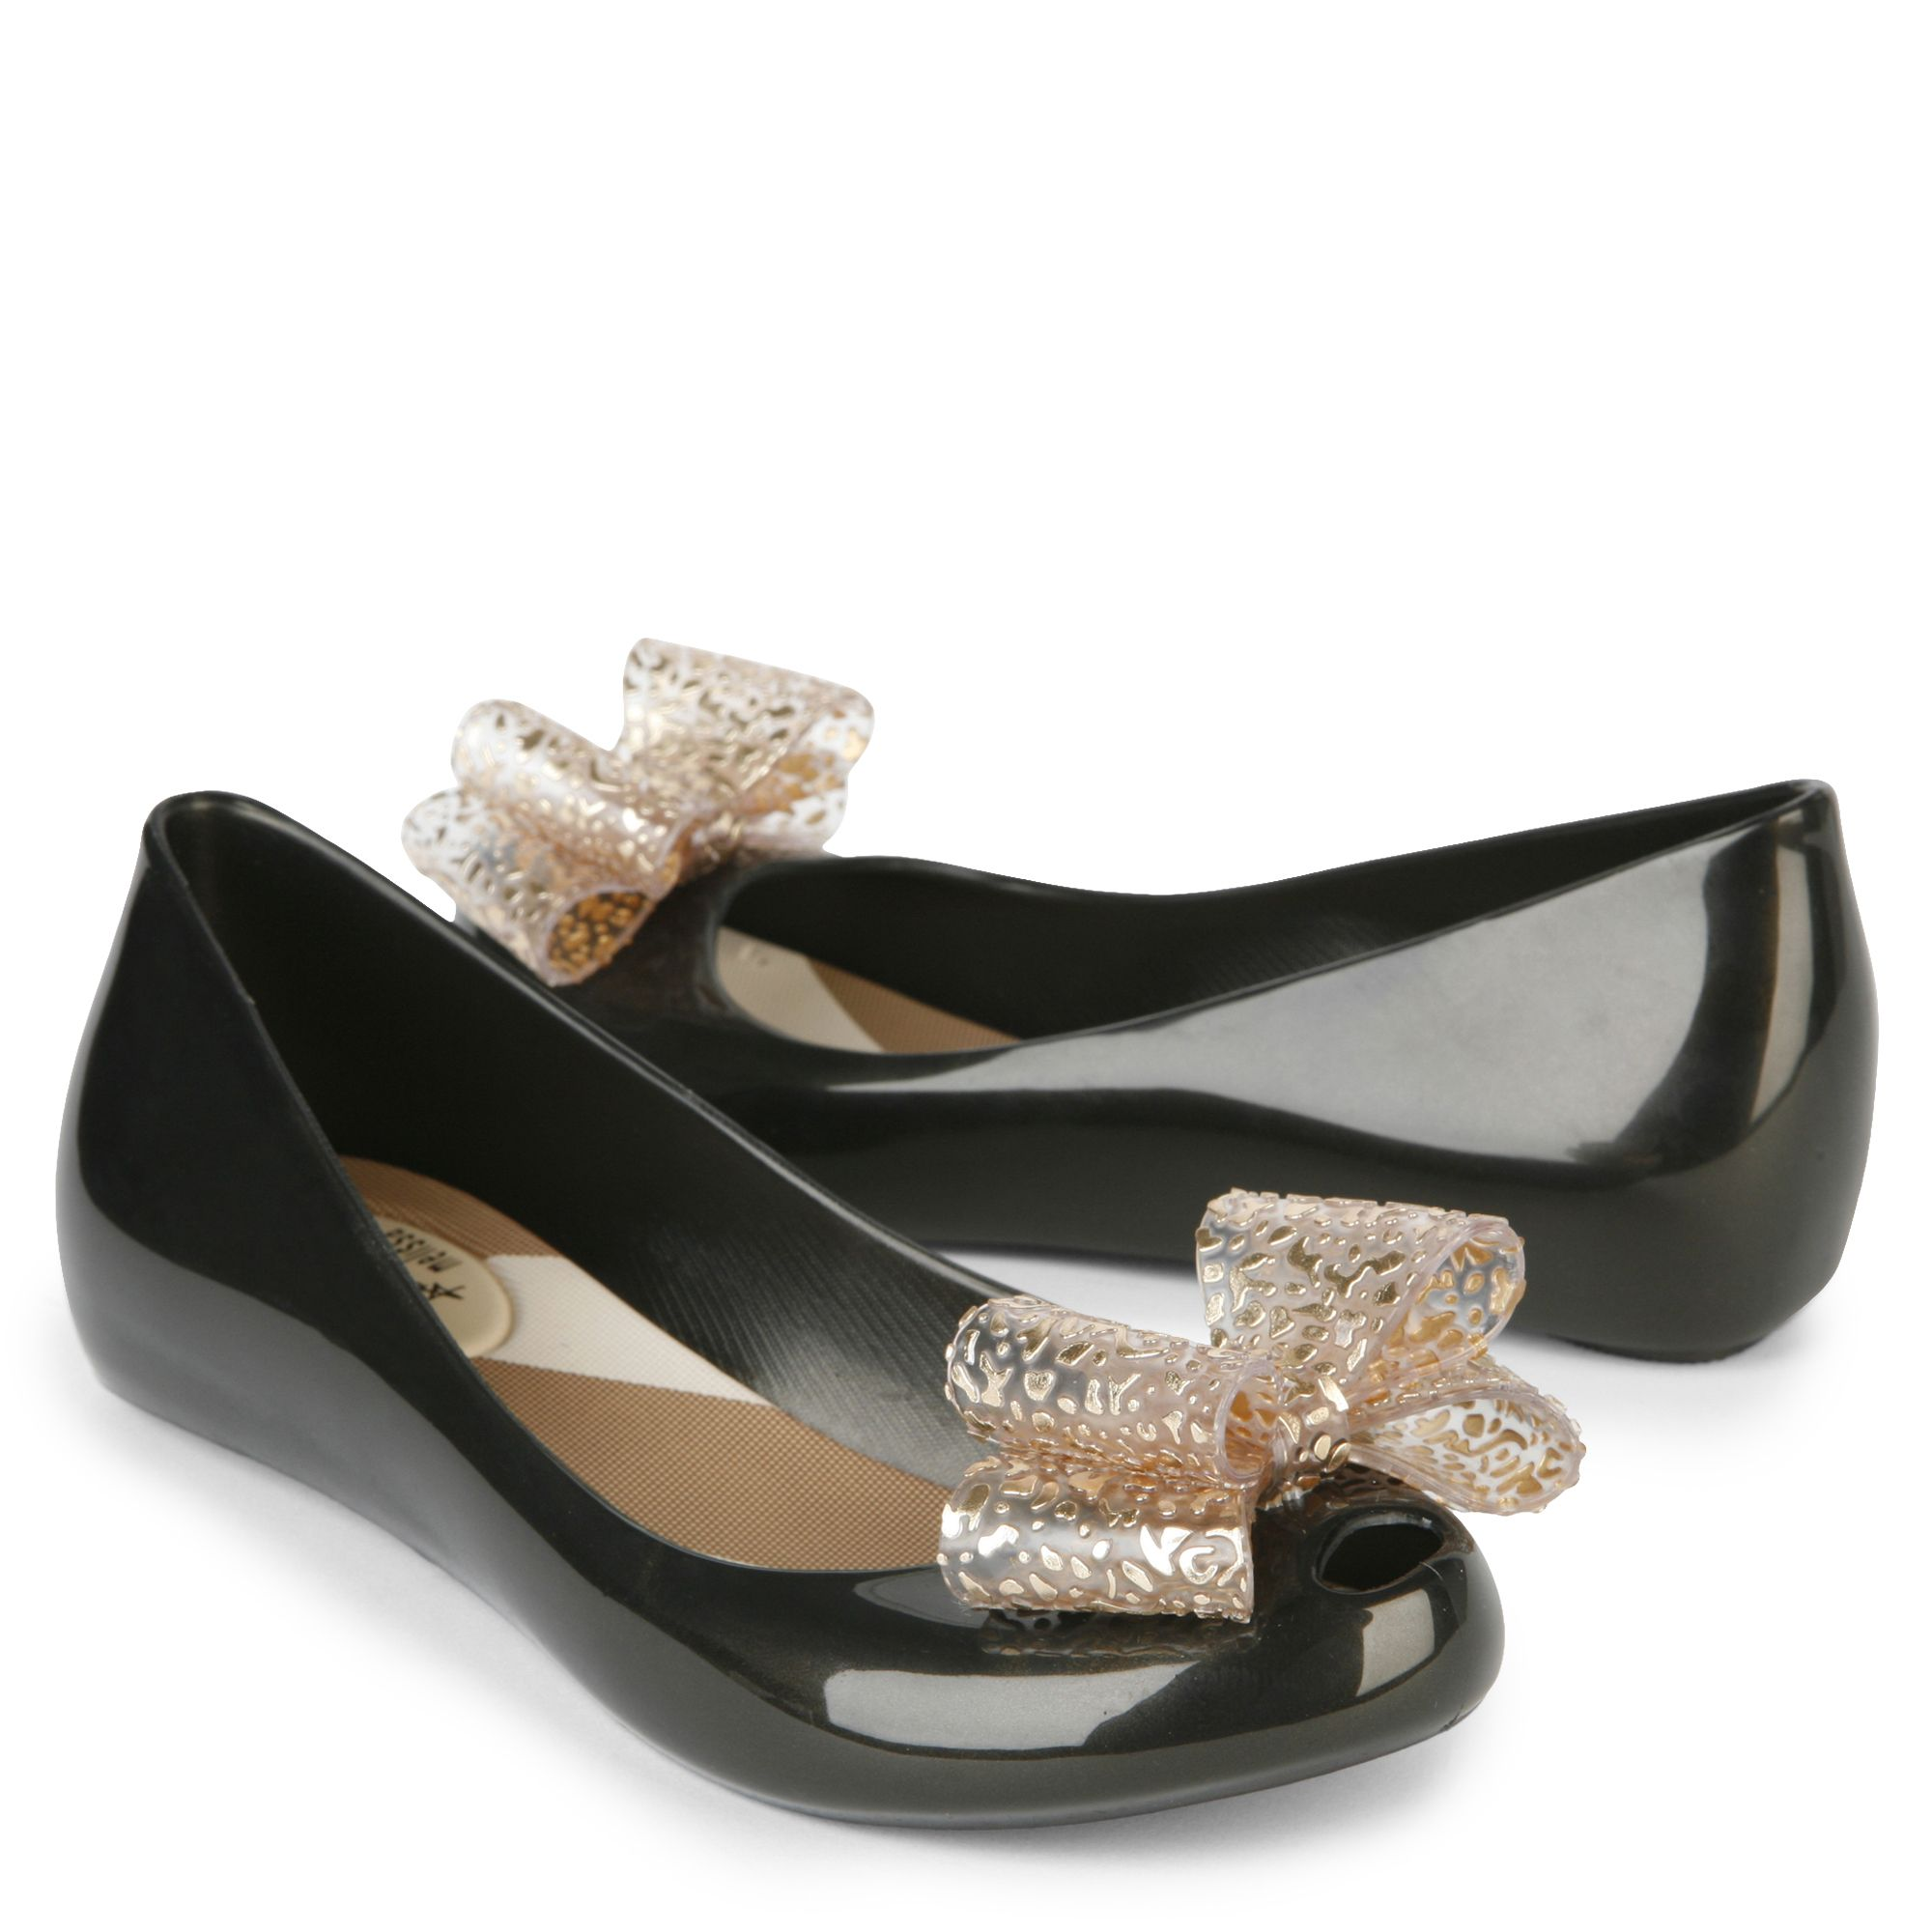 Vivienne Westwood Dolly Shoes Sale